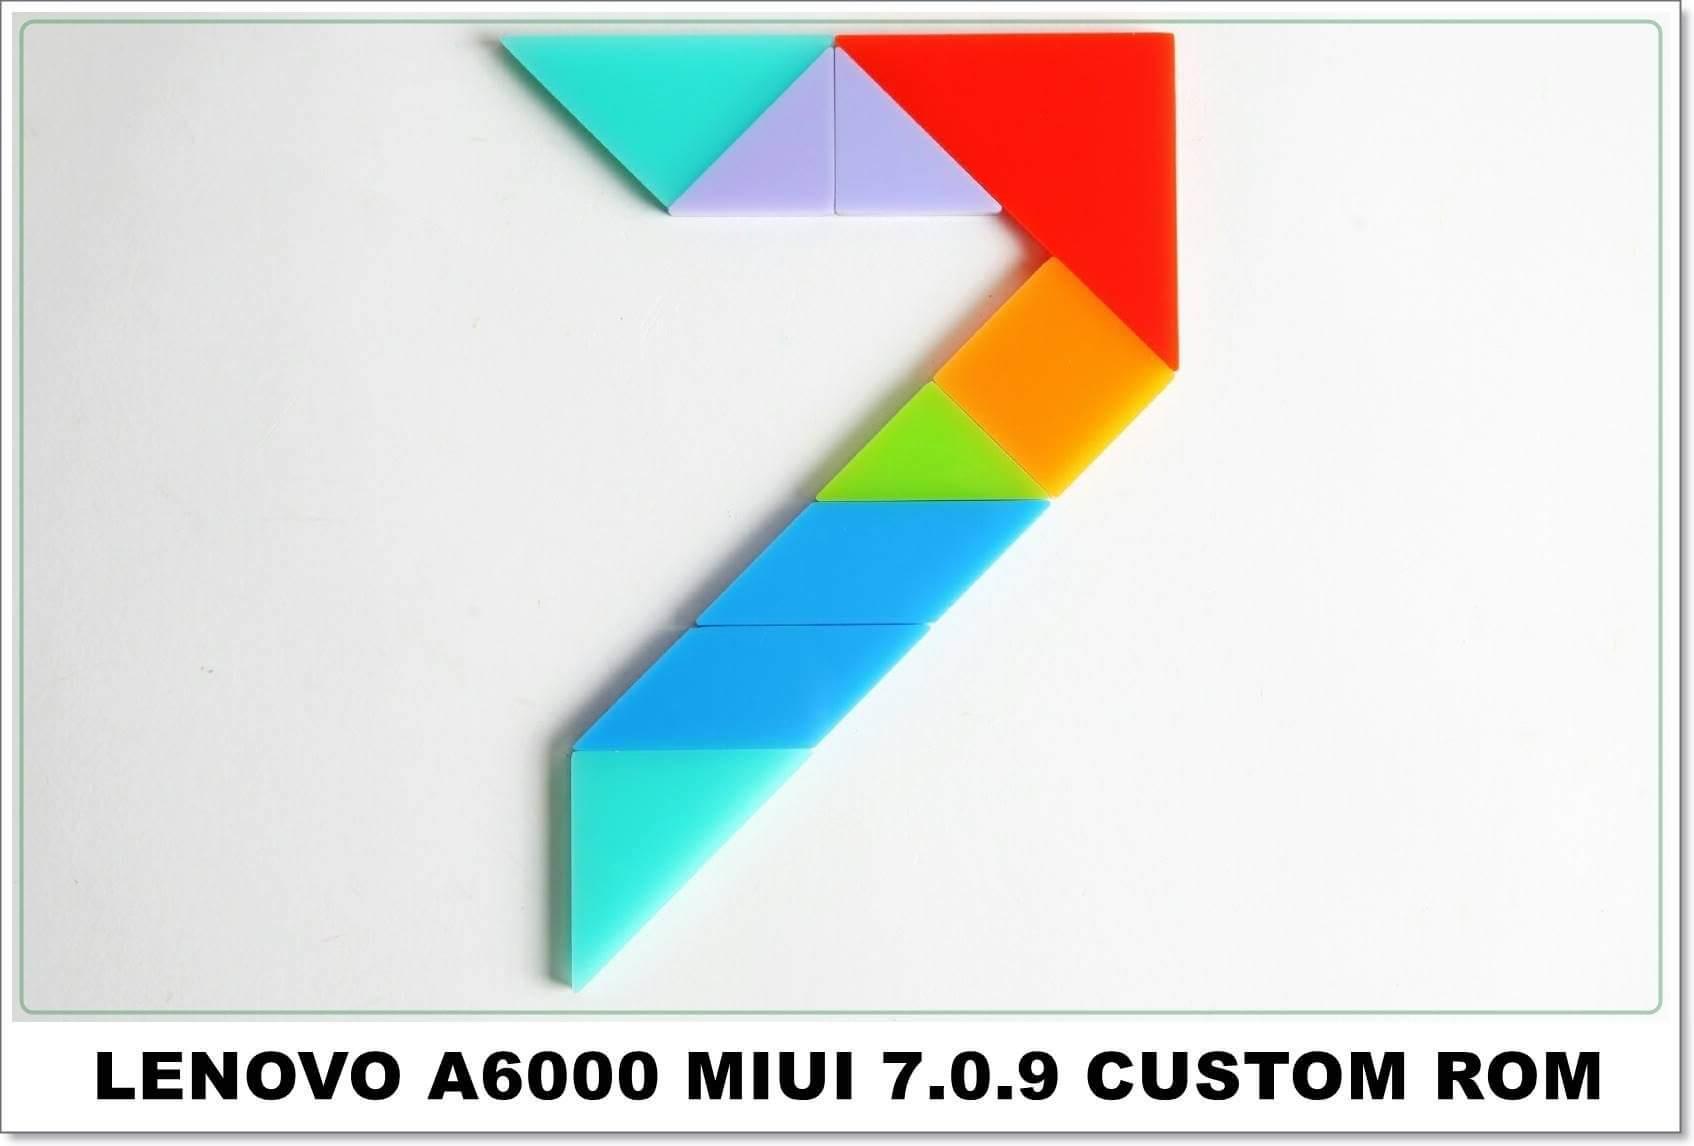 miui-7.0.9-lenovo-a6000